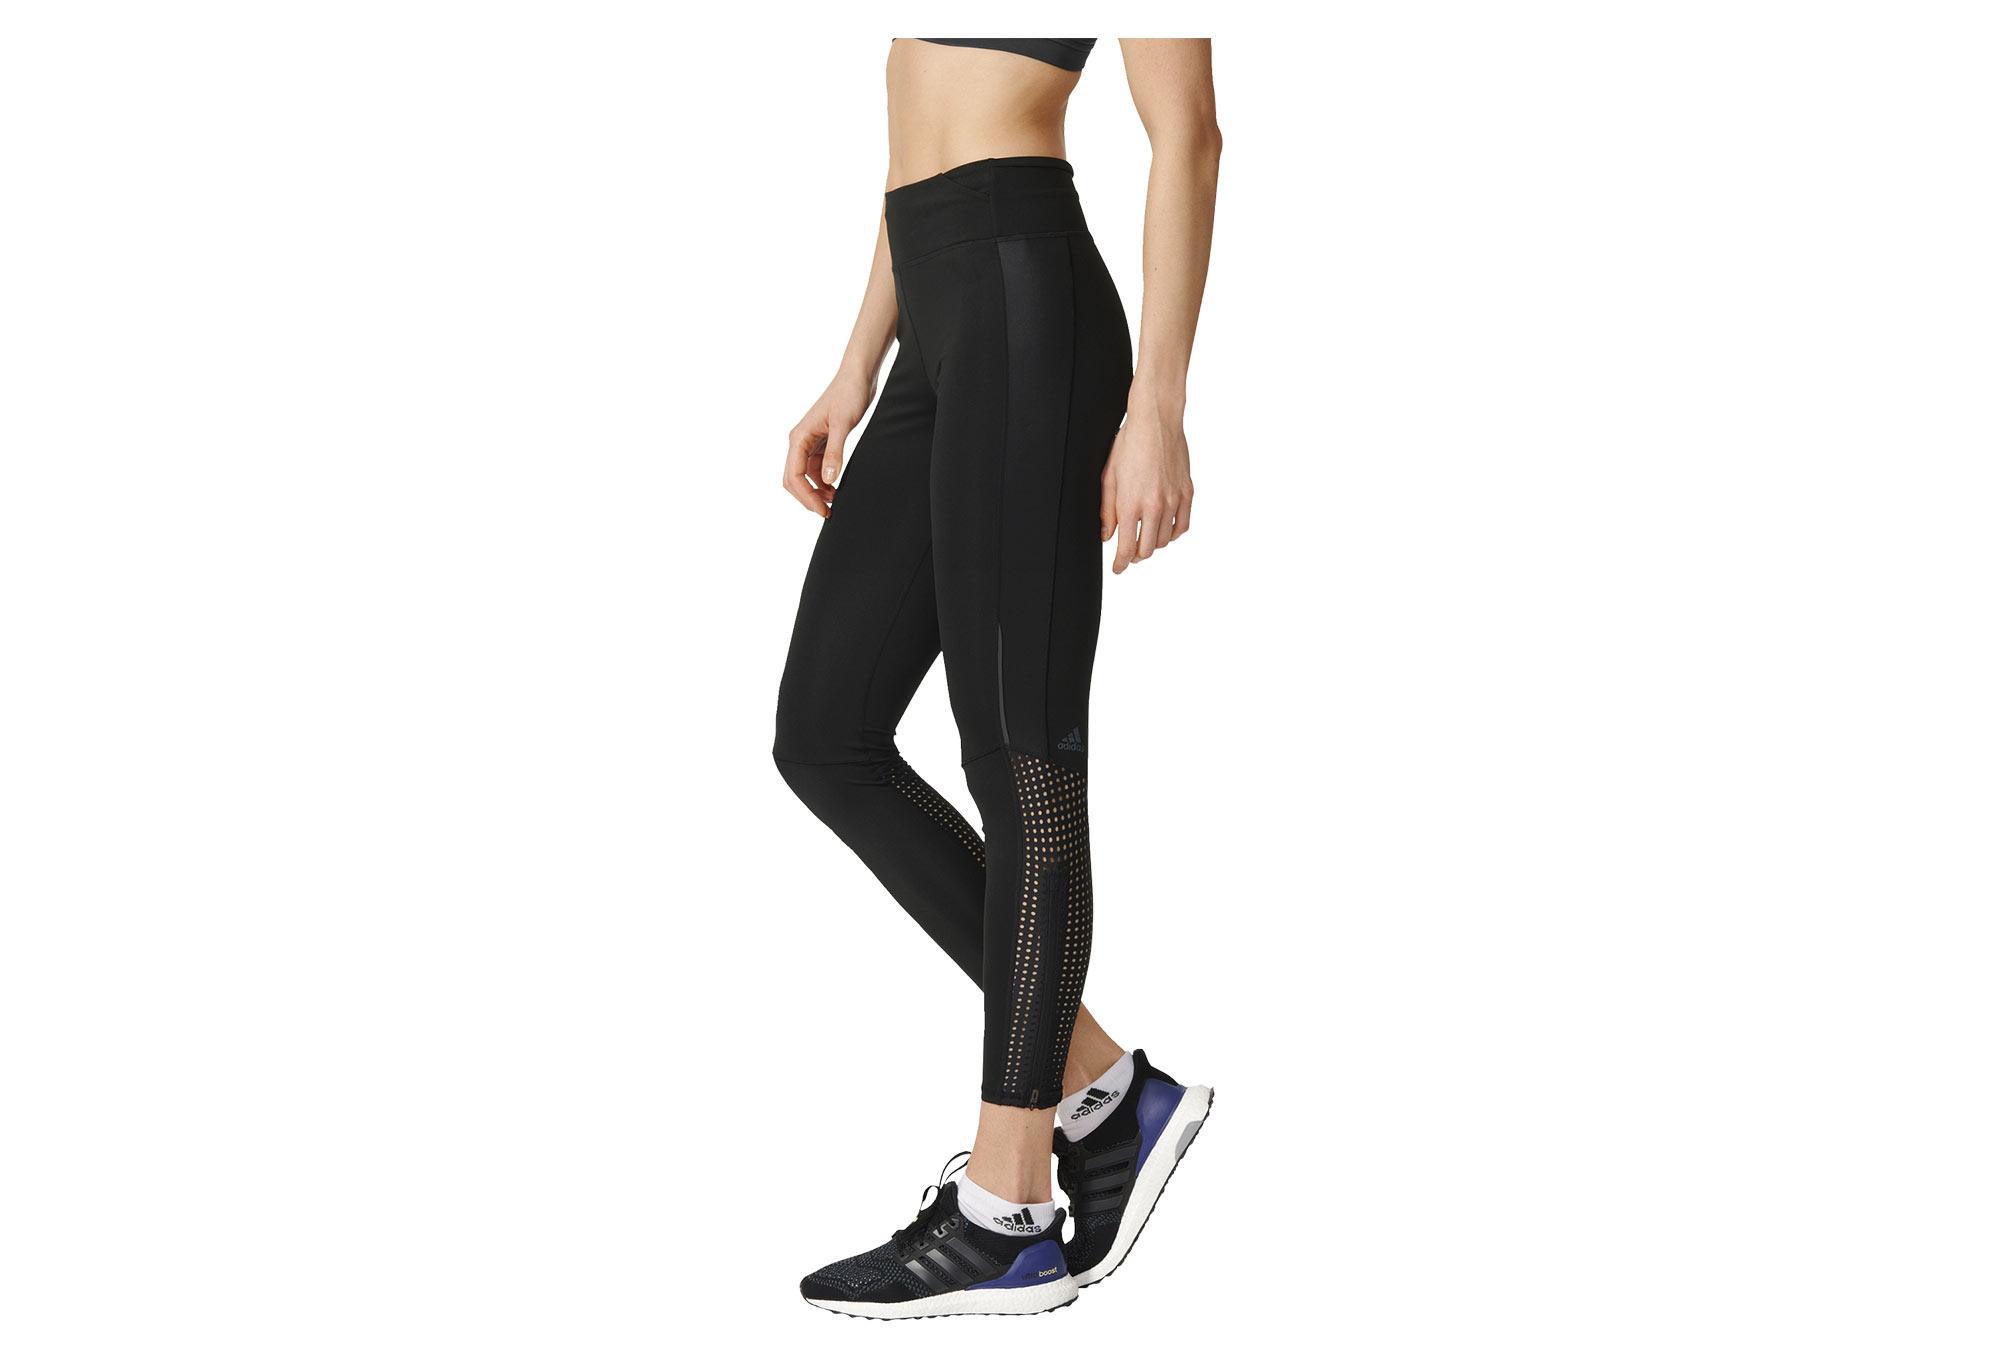 pantaloni adidas ragazza lunghi